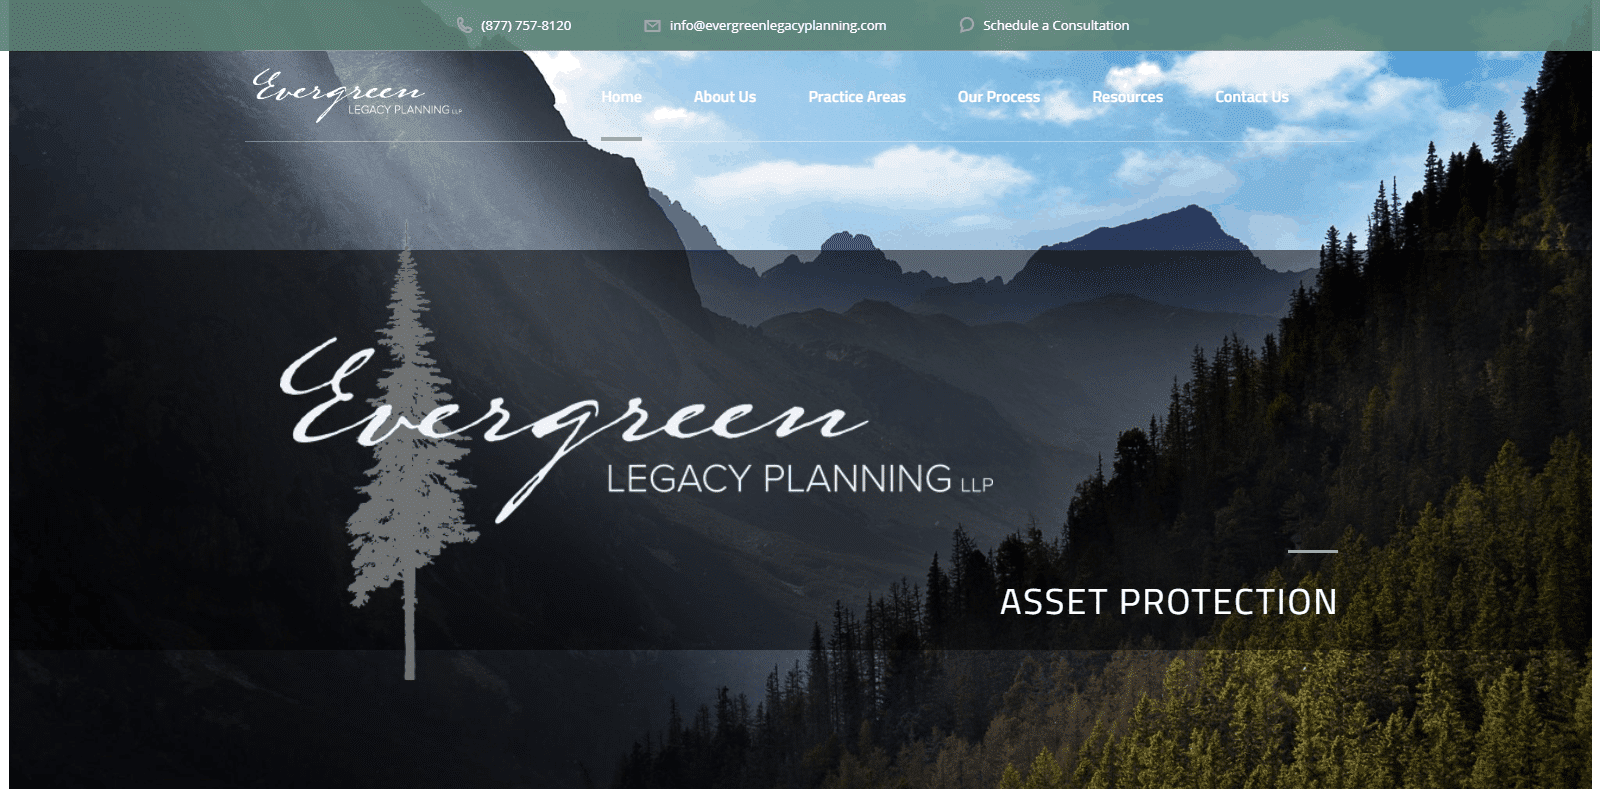 portfolio-evergreen-image1